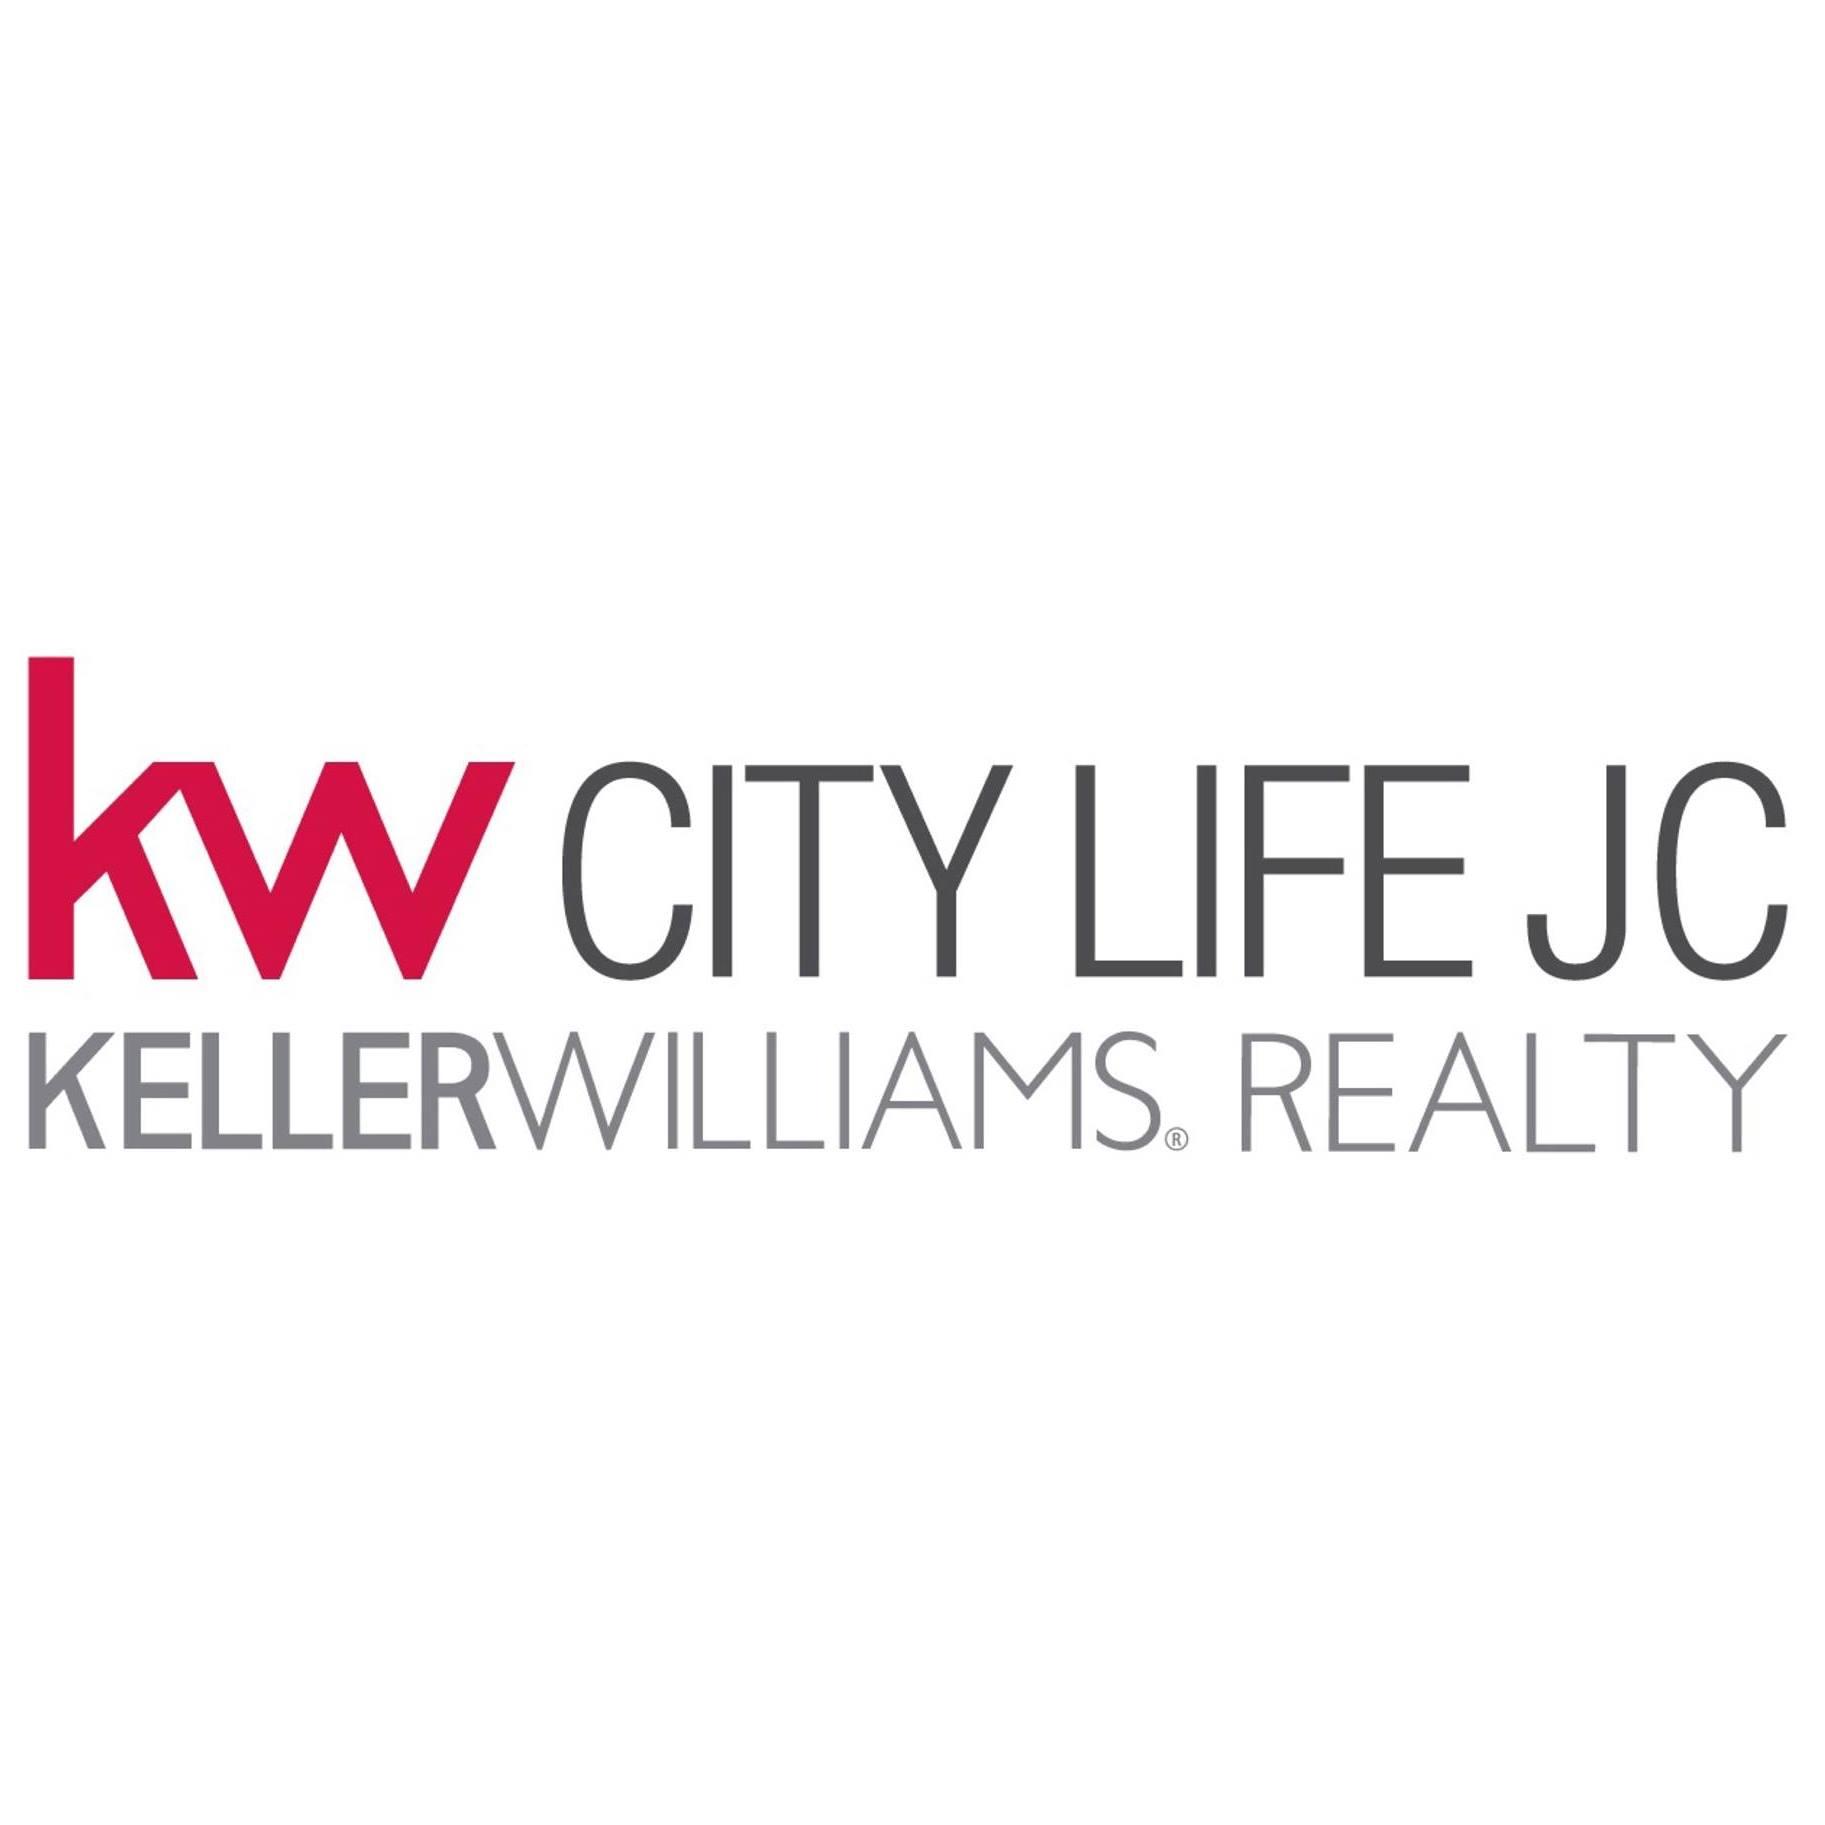 KellerWilliams_Realty_CityLife_Logo_RGB.jpg